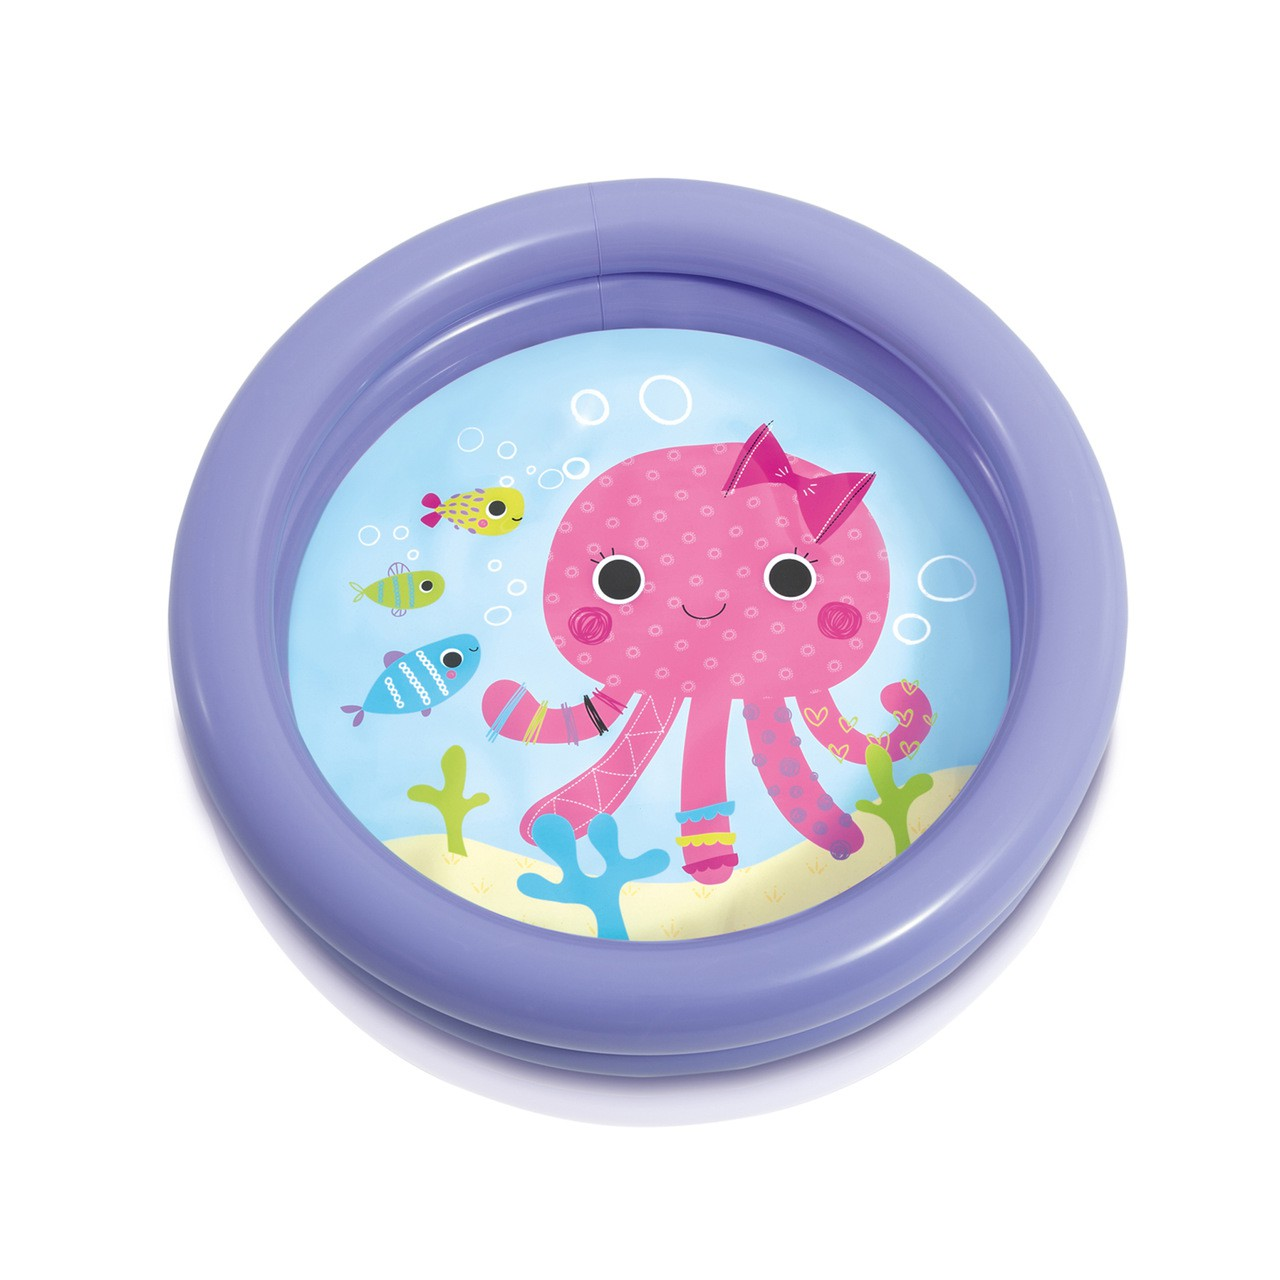 Piscina Infantil Inflável Baby 17L Roxo - Intex 59409